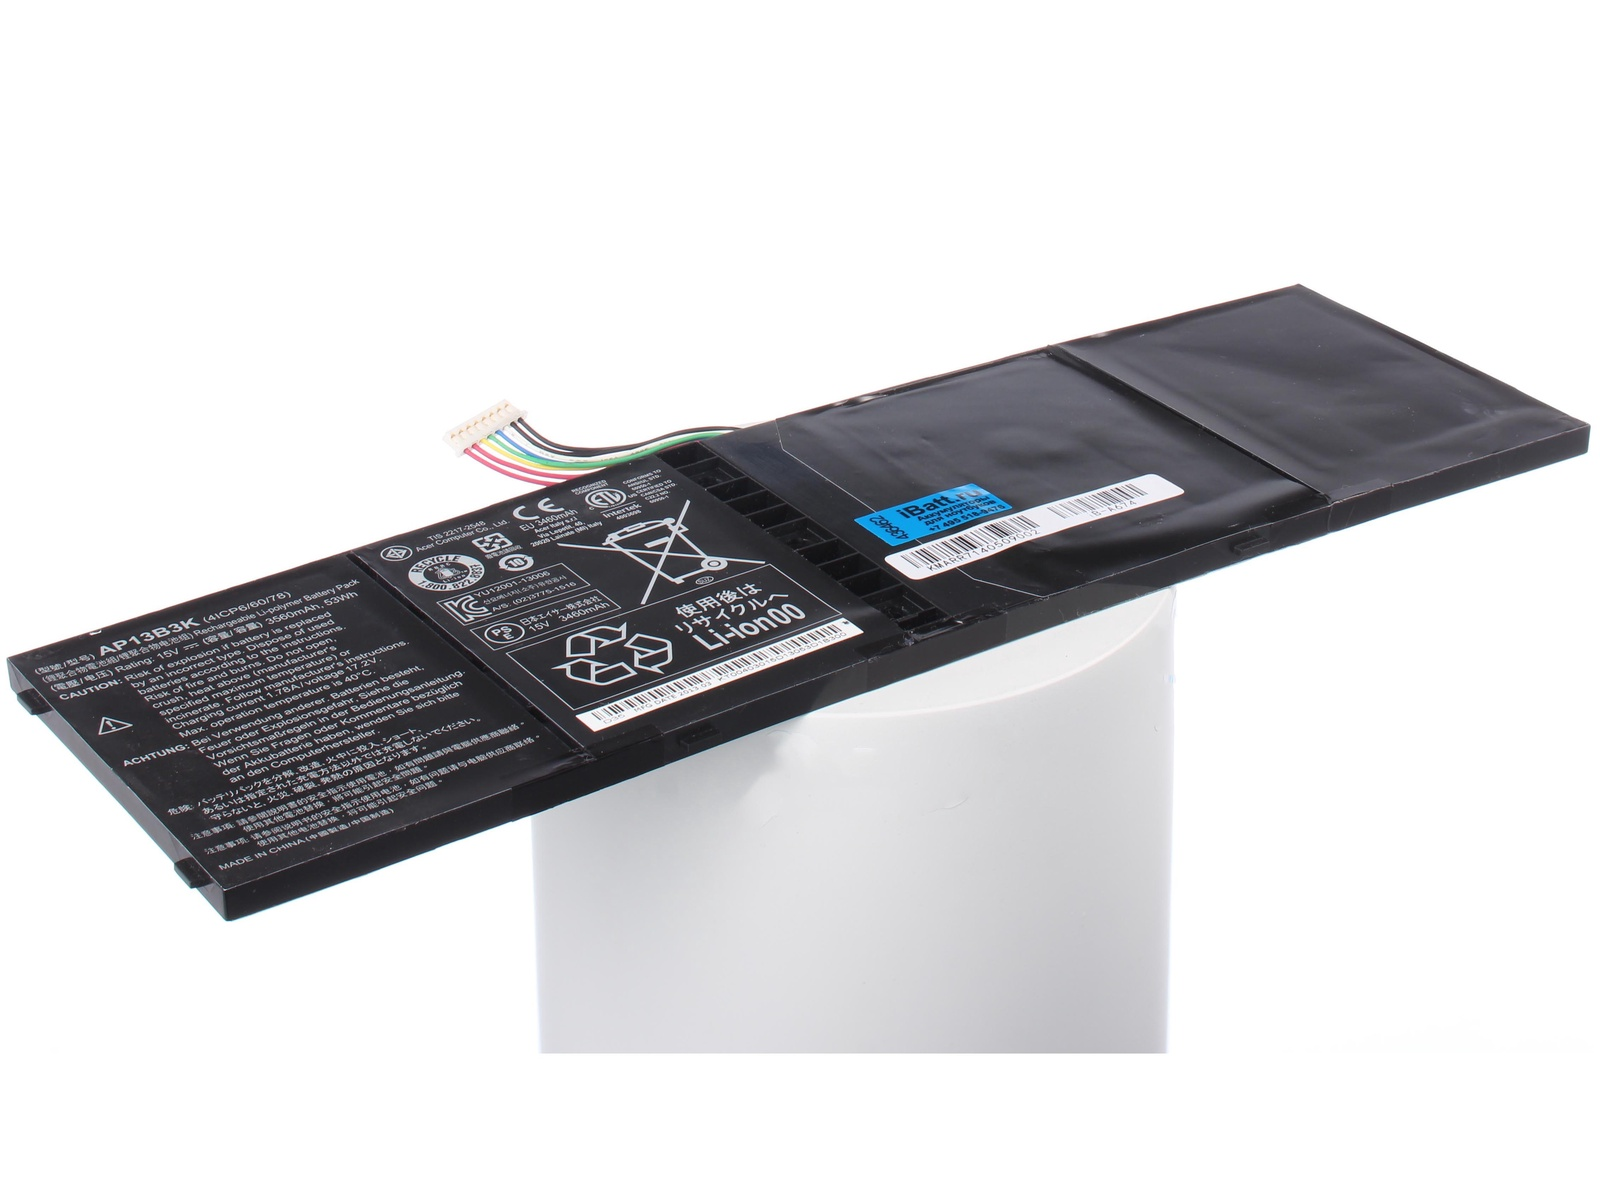 Аккумулятор для ноутбука iBatt для Acer Aspire R7-572G-74518G1Tass, Aspire V5-473G, Aspire V5-552G-85558G50akk, Aspire V5-573-34014G50a, Aspire R3-471TG-38XV, Aspire R7-572G-54206G75a, Aspire R7-572G-74506G75ass original 14 lcd touch screen digitizer assembly display for acer aspire r3 471 r3 471tg laptop